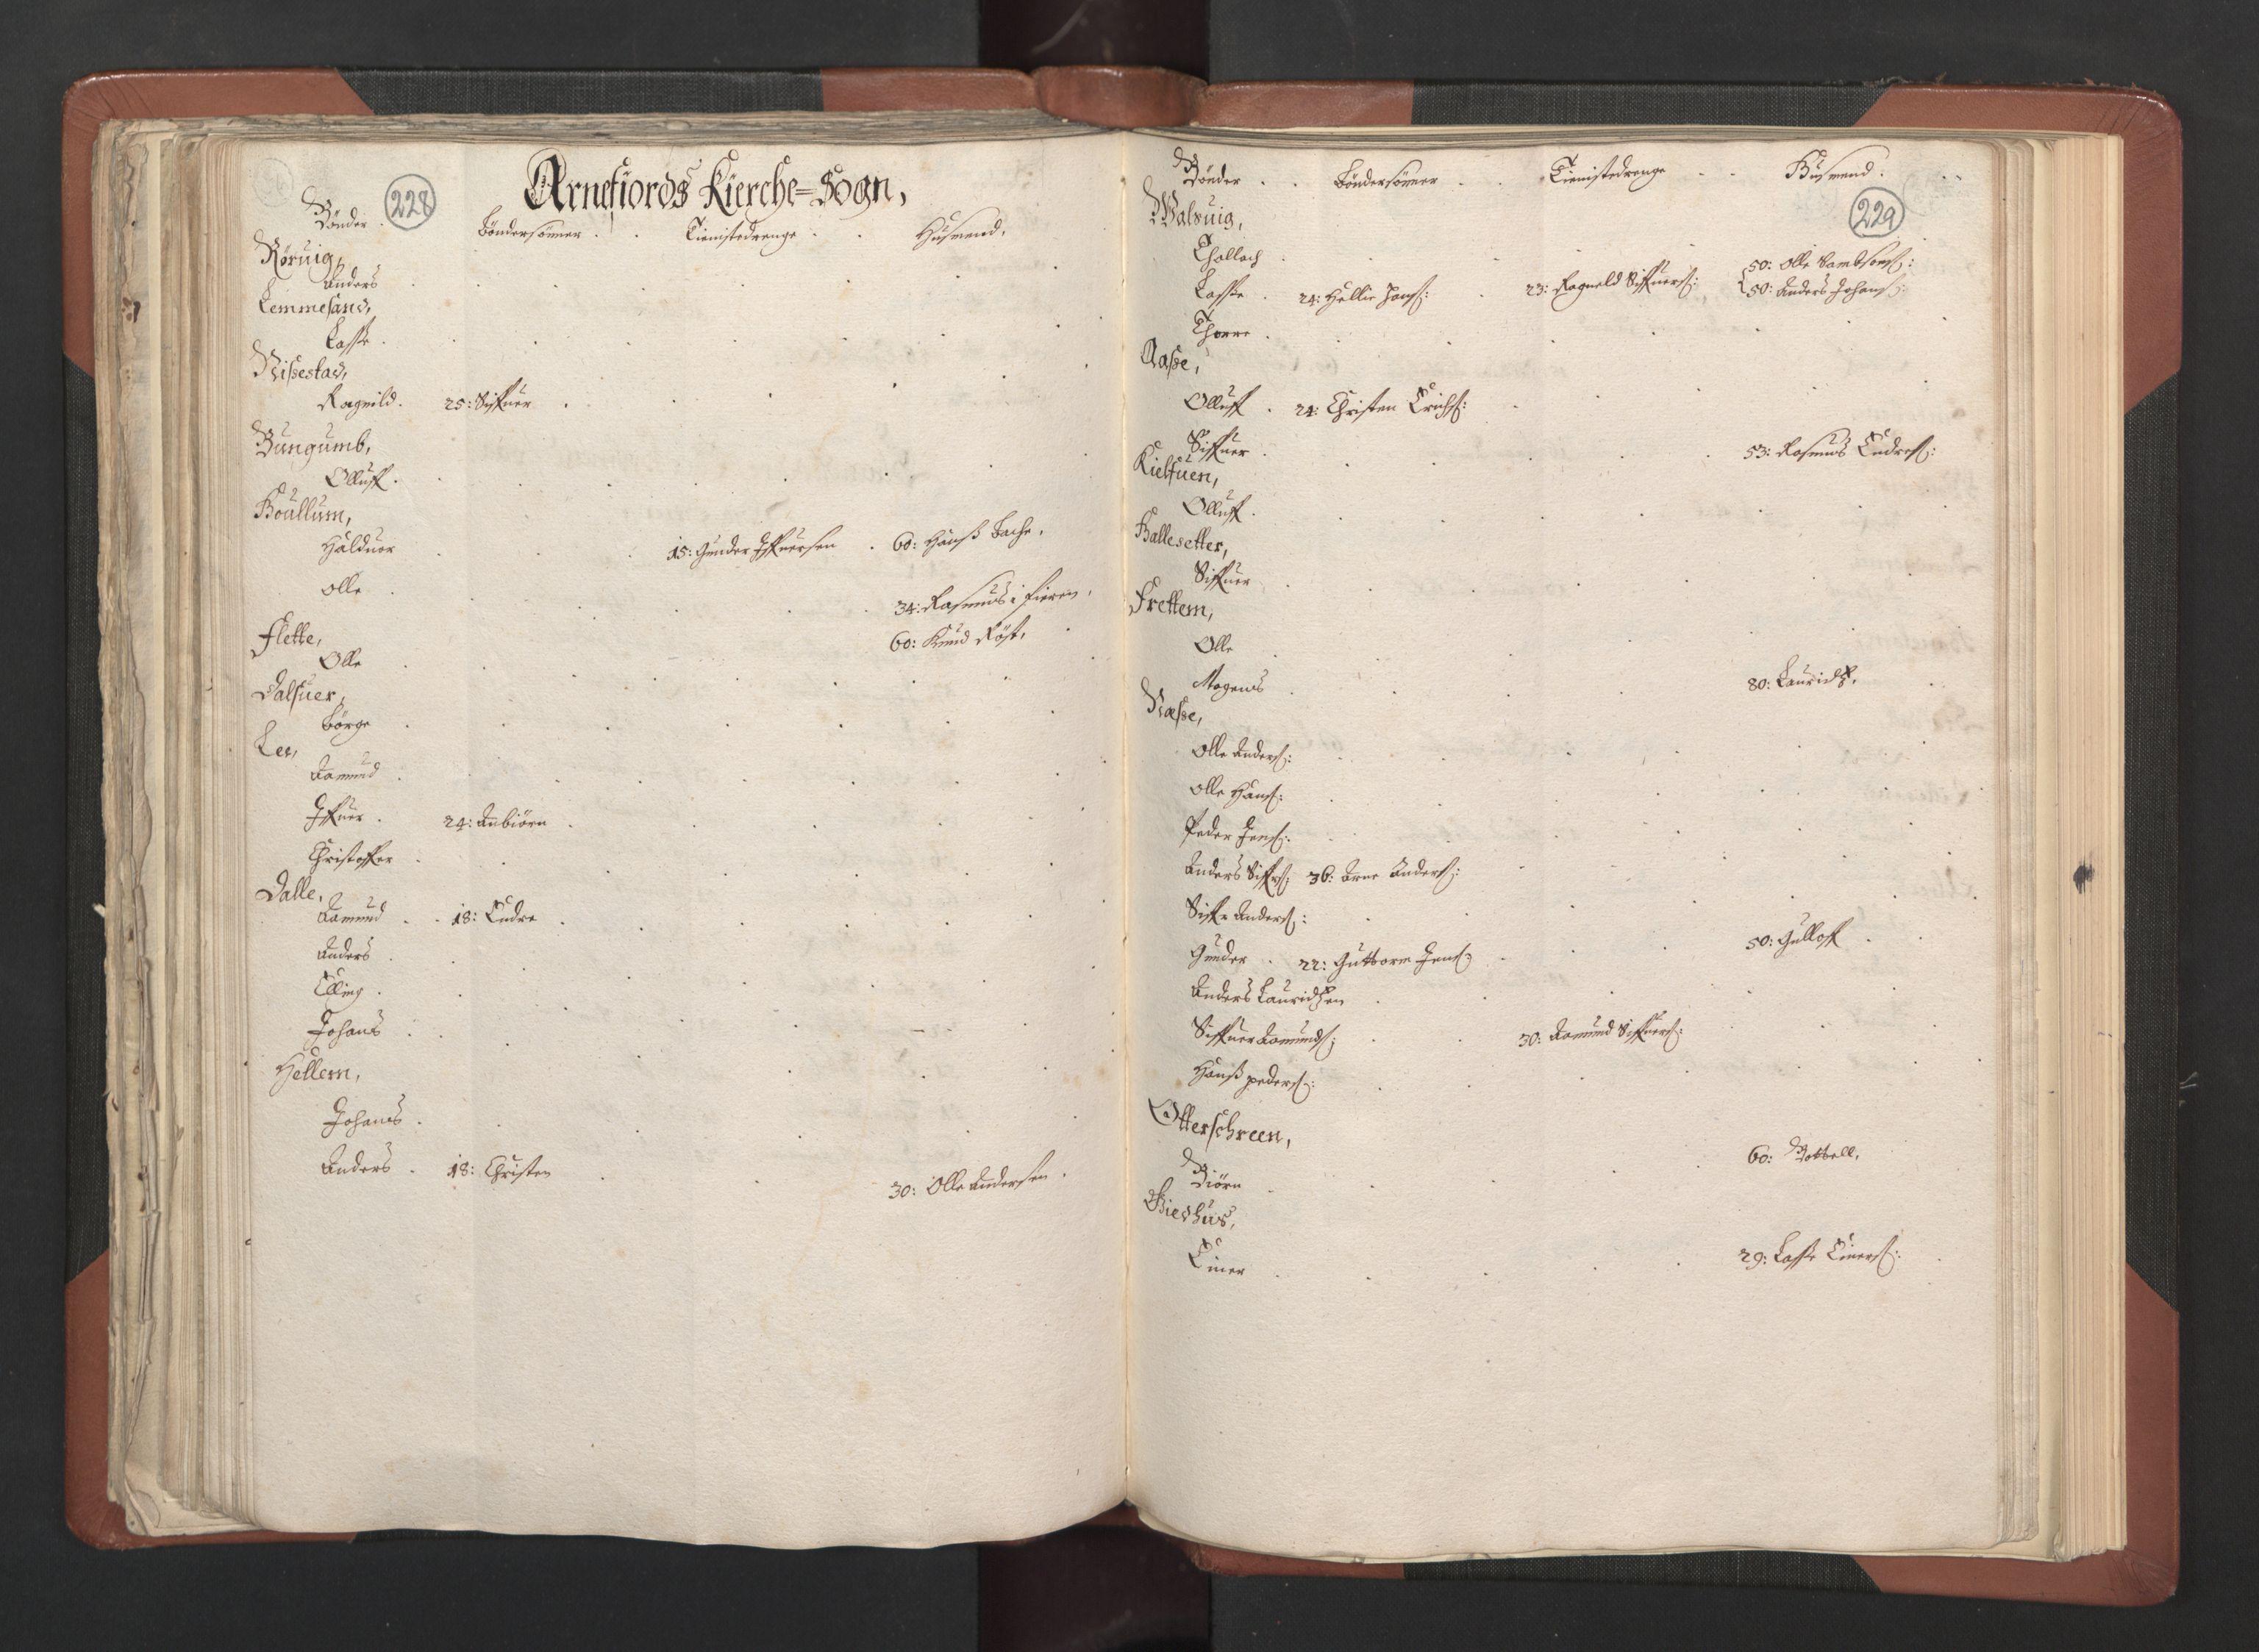 RA, Fogdenes og sorenskrivernes manntall 1664-1666, nr. 14: Hardanger len, Ytre Sogn fogderi og Indre Sogn fogderi, 1664-1665, s. 228-229